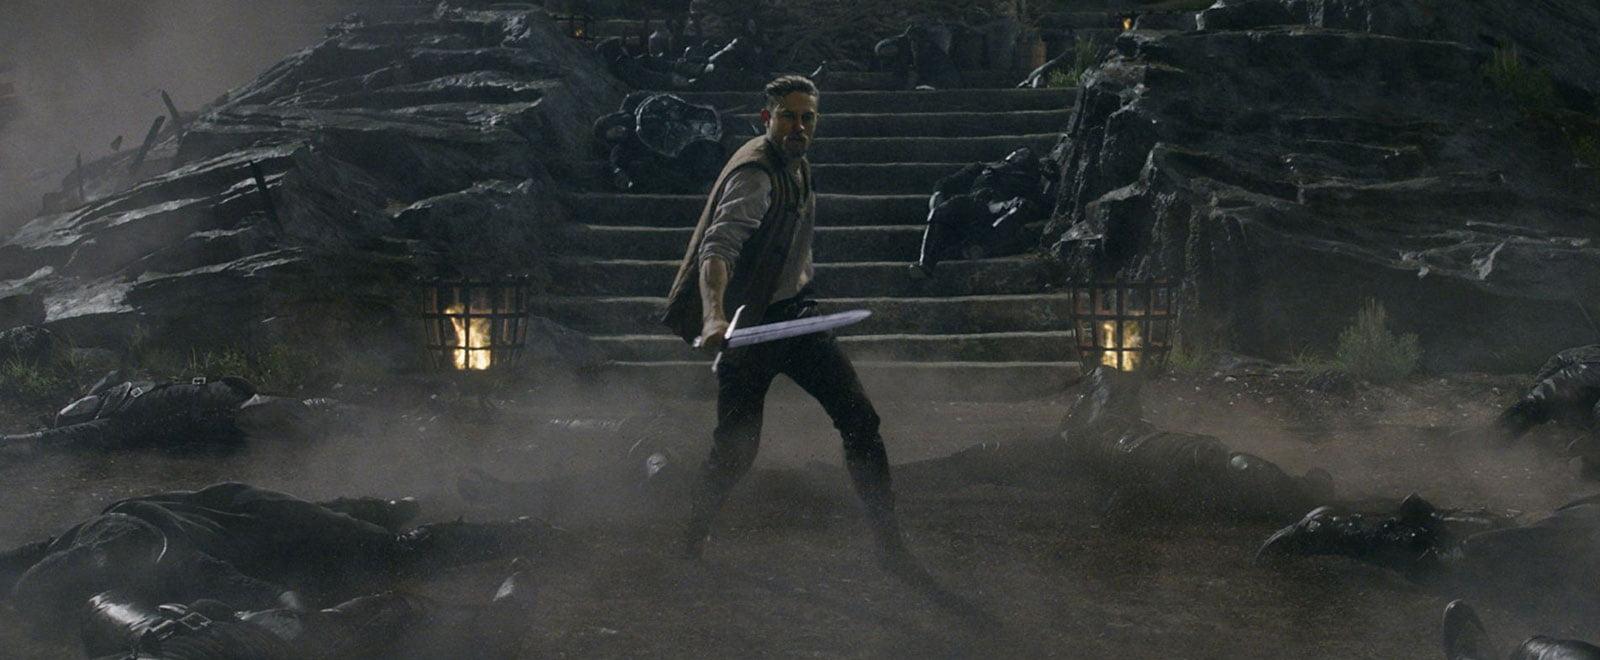 Король Артур: Легенда меча / King Arthur: Legend of the Sword (2017)